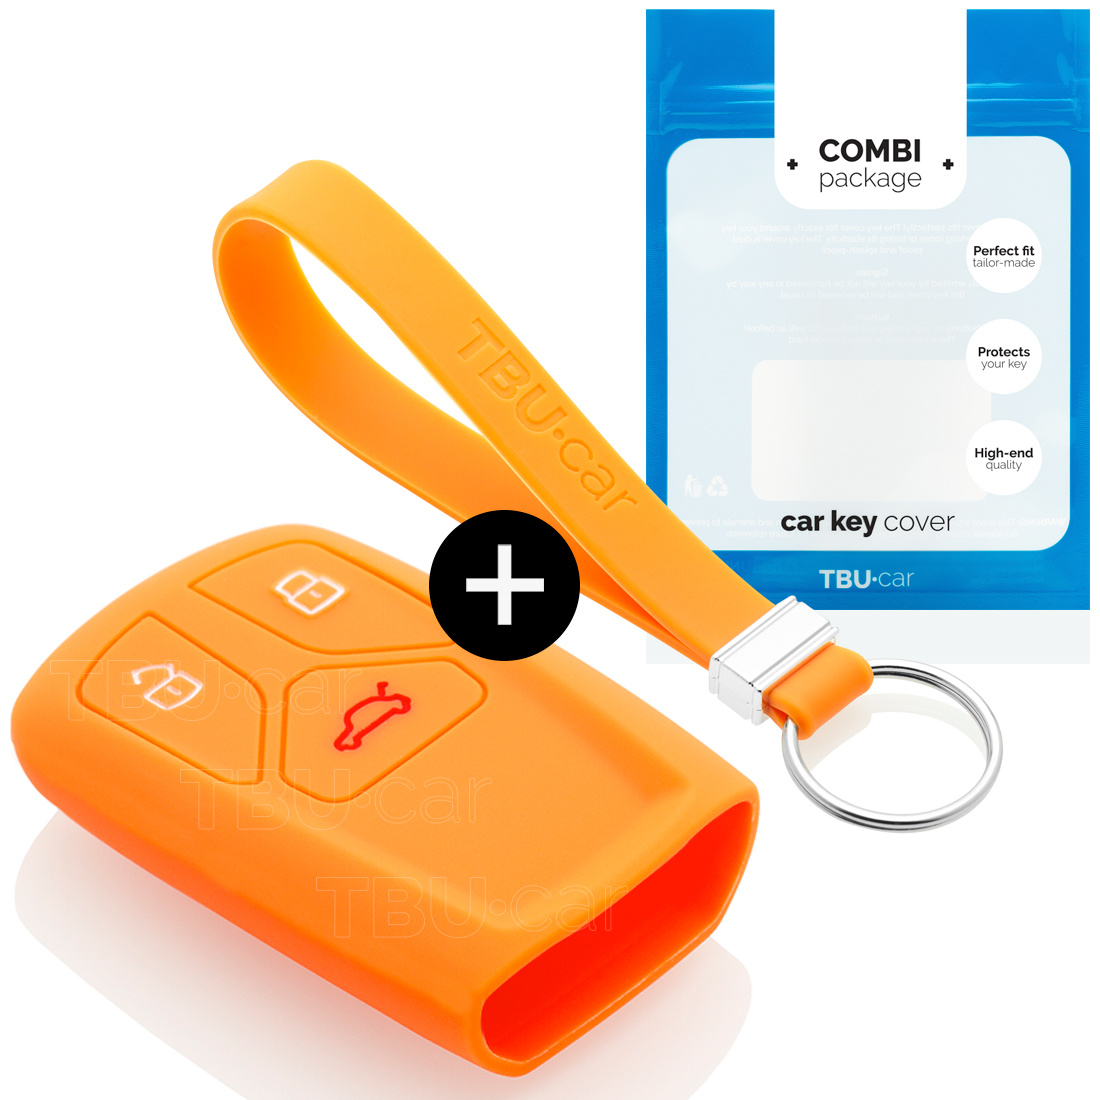 Audi Car key cover - Silicone Protective Remote Key Shell - FOB Case Cover - Orange